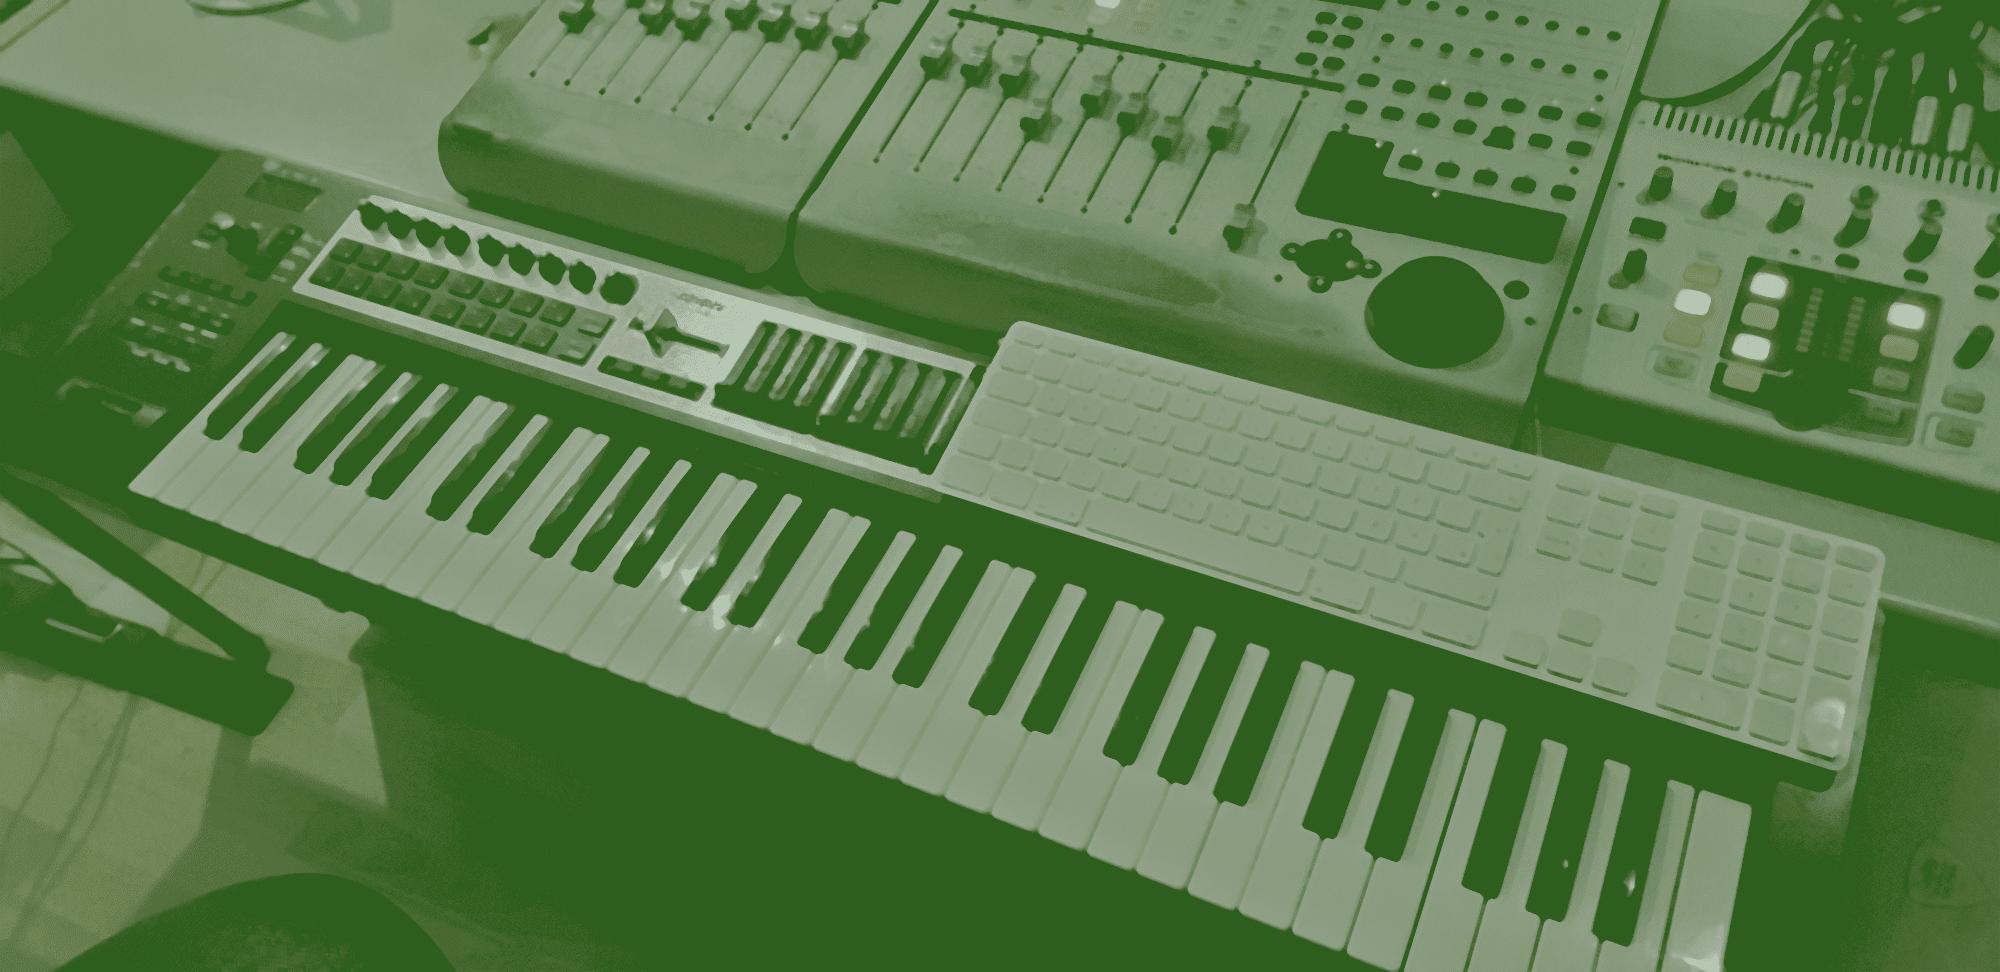 Musikstudiet 5th vision